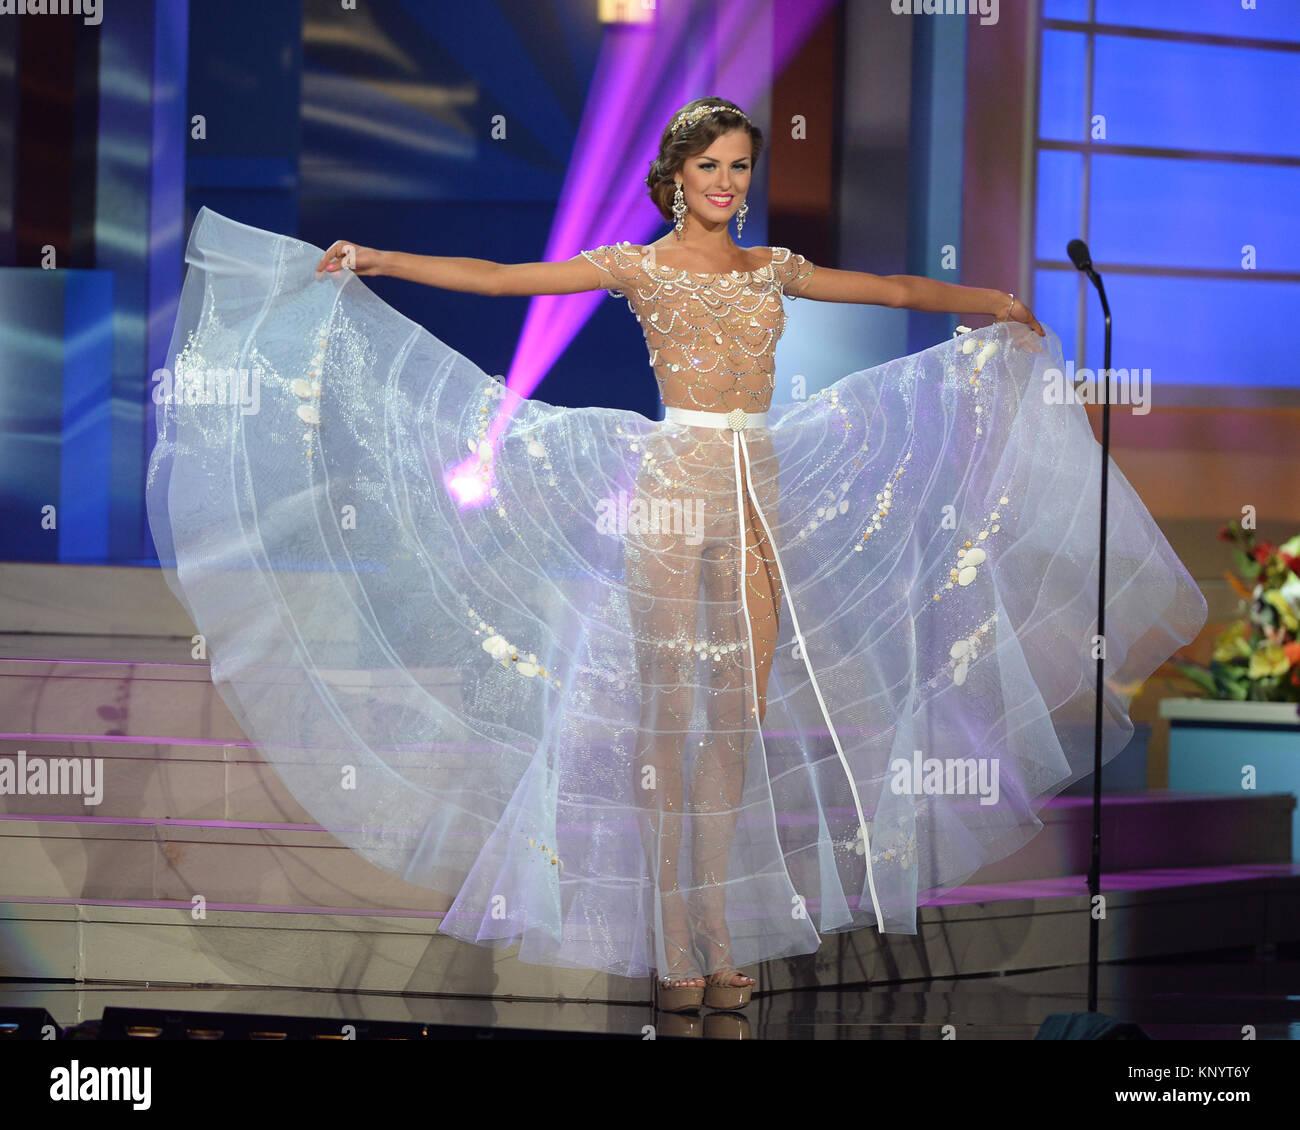 MIAMI, FL - 21 de enero: Miss Lituania Patricija Belousova compite en la 63 edición anual de Miss Universo la competencia Foto de stock